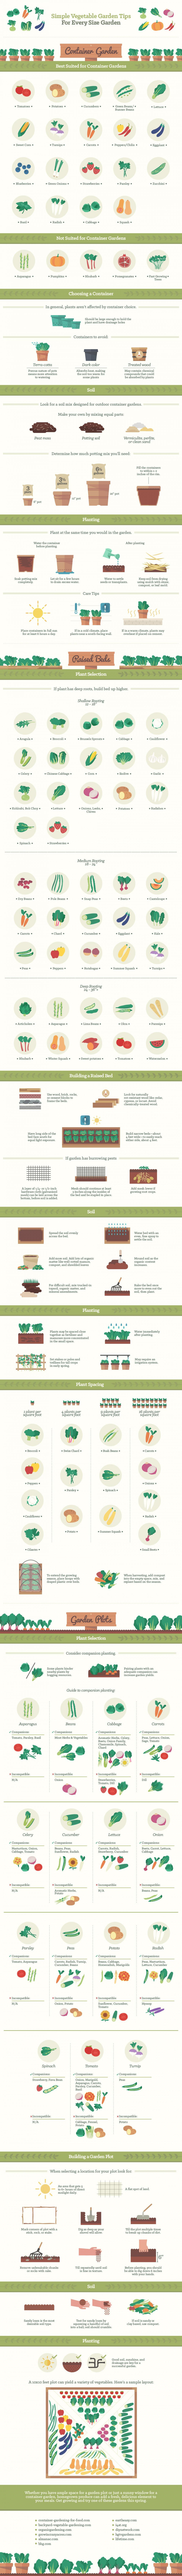 Simple Vegetable Garden Tips for Every Size Garden